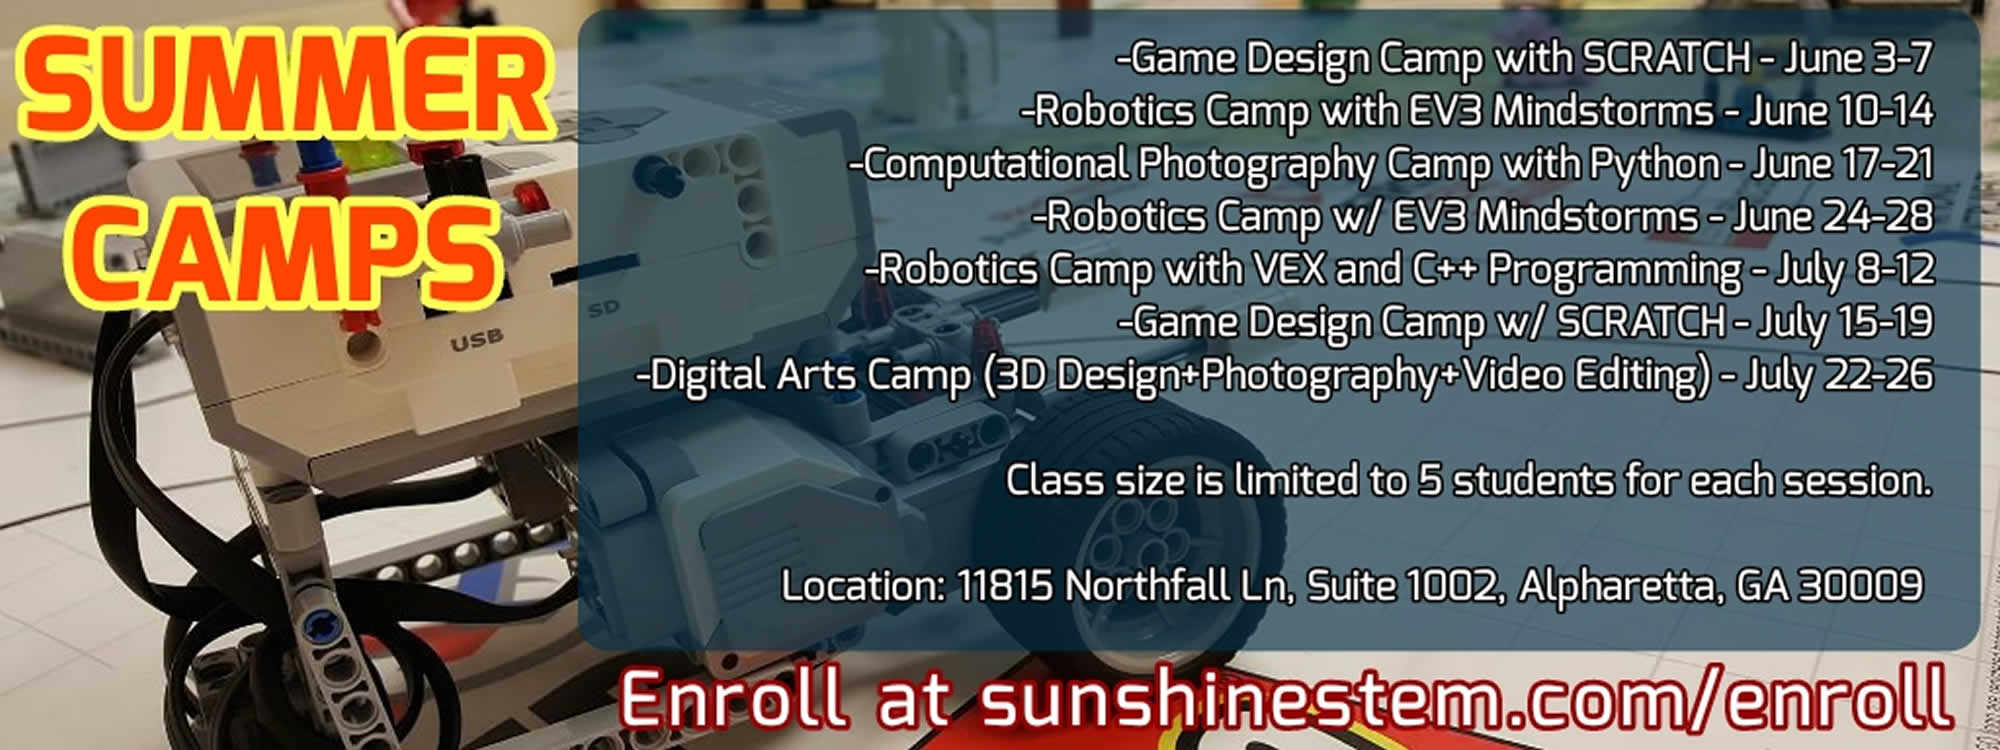 Sunshine STEM Academy Summer Camps 2019